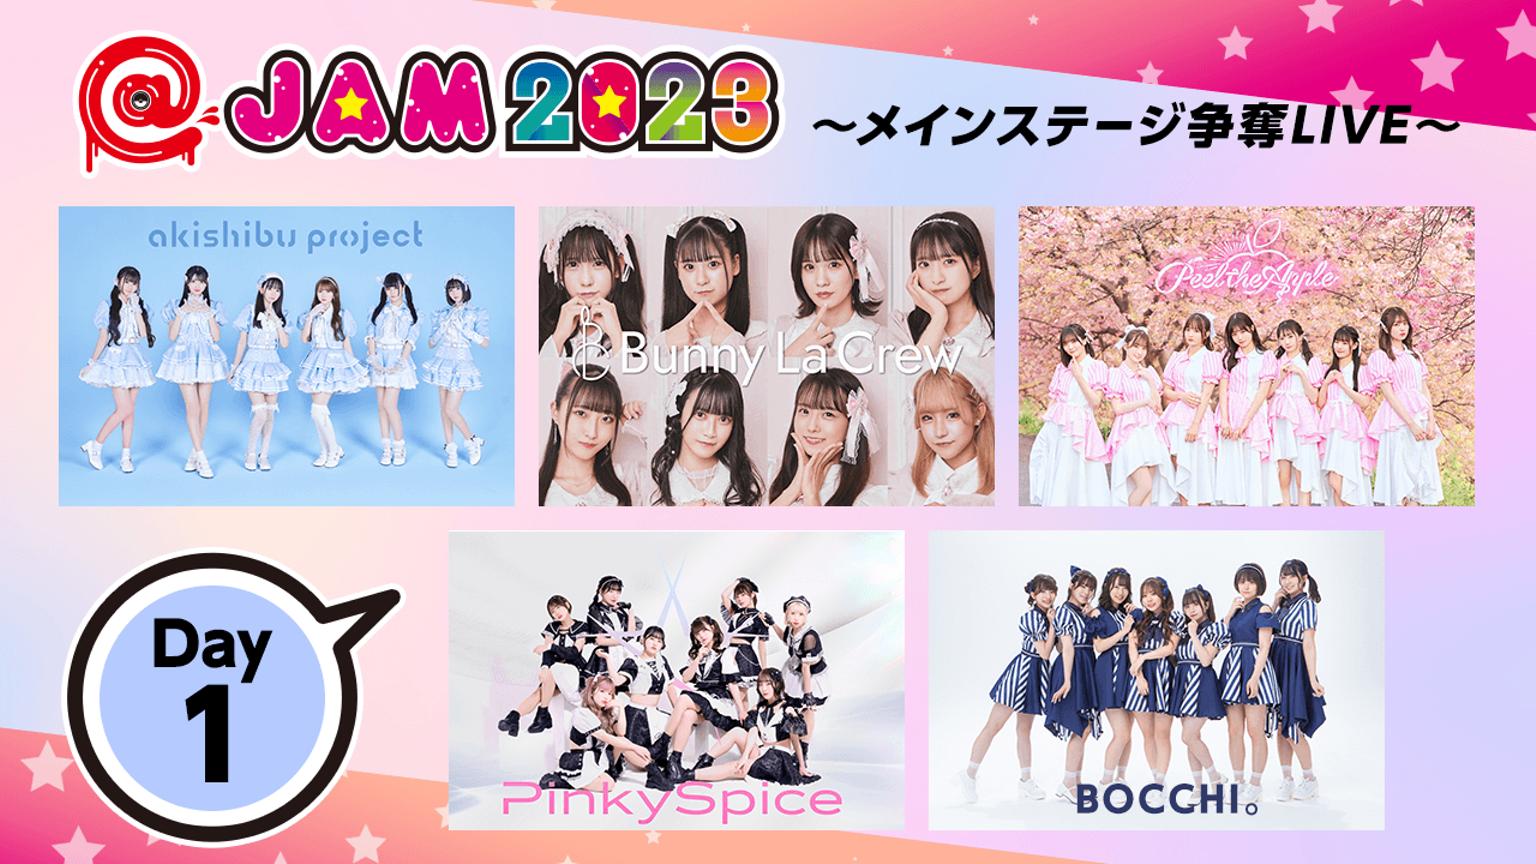 @JAM 2021 Day1〜メインステージ争奪LIVE〜